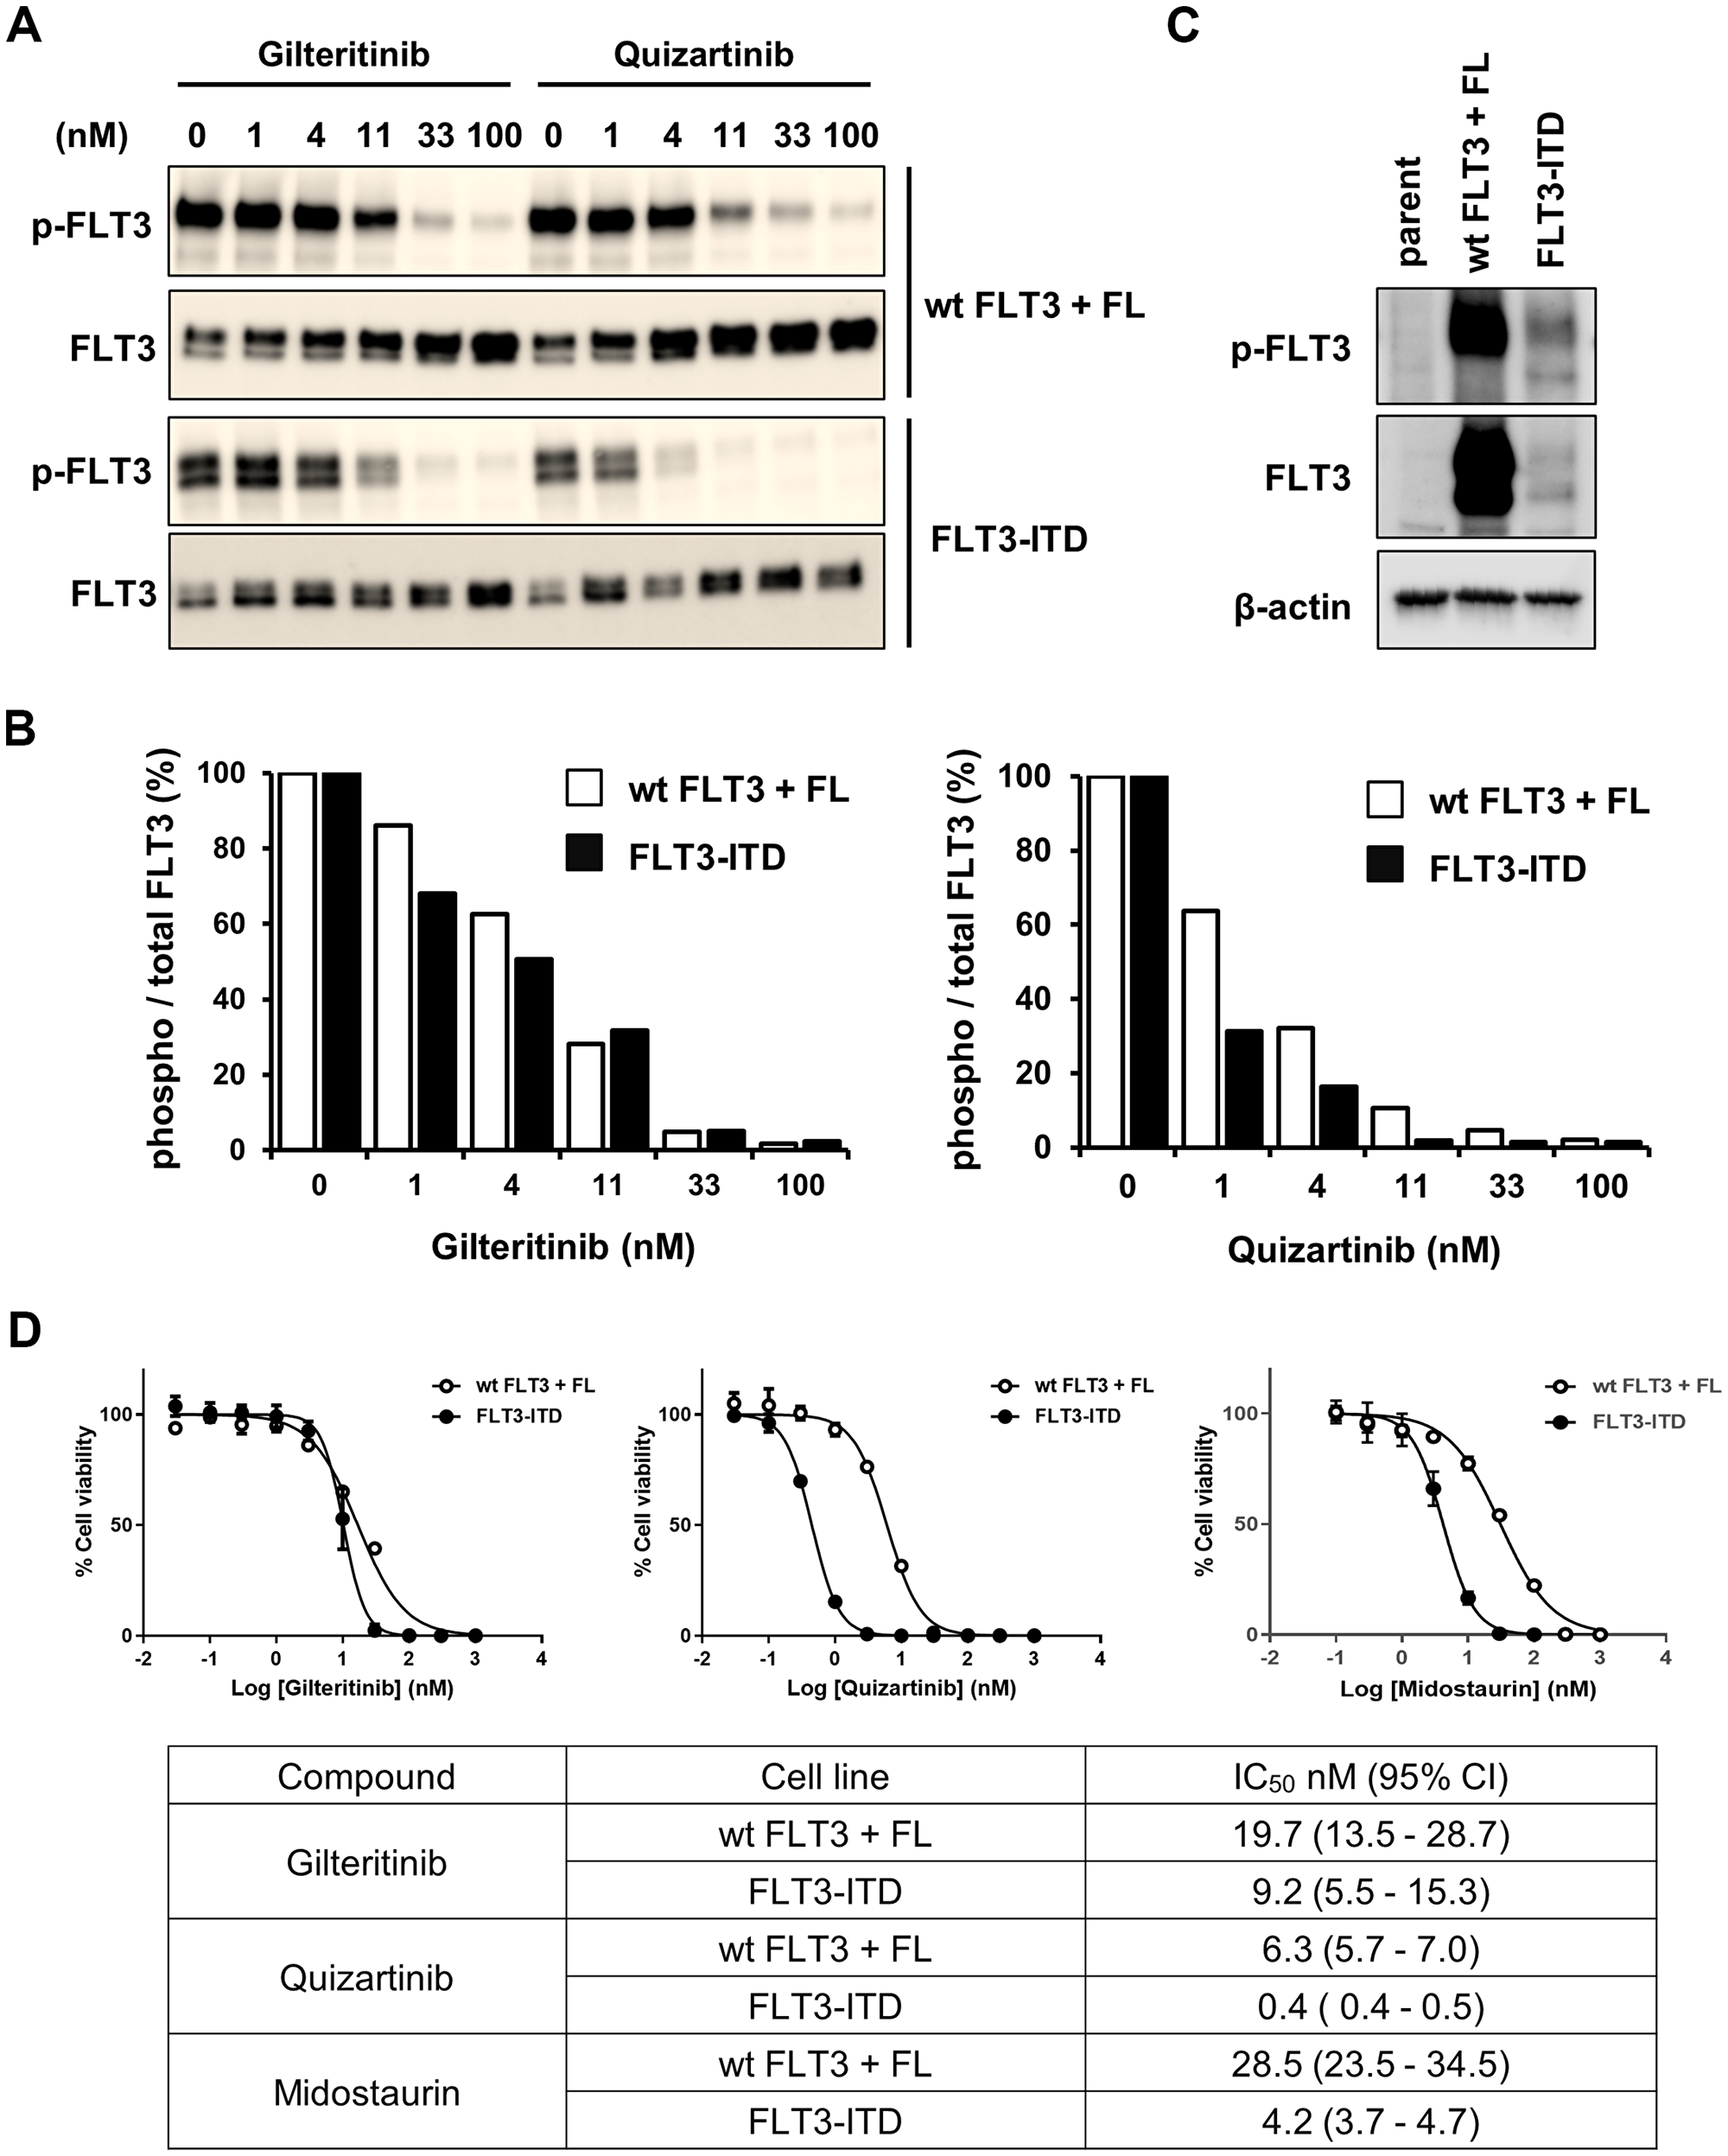 Inhibitory effects of gilteritinib and quizartinib on FLT3wt and FLT3-ITD.